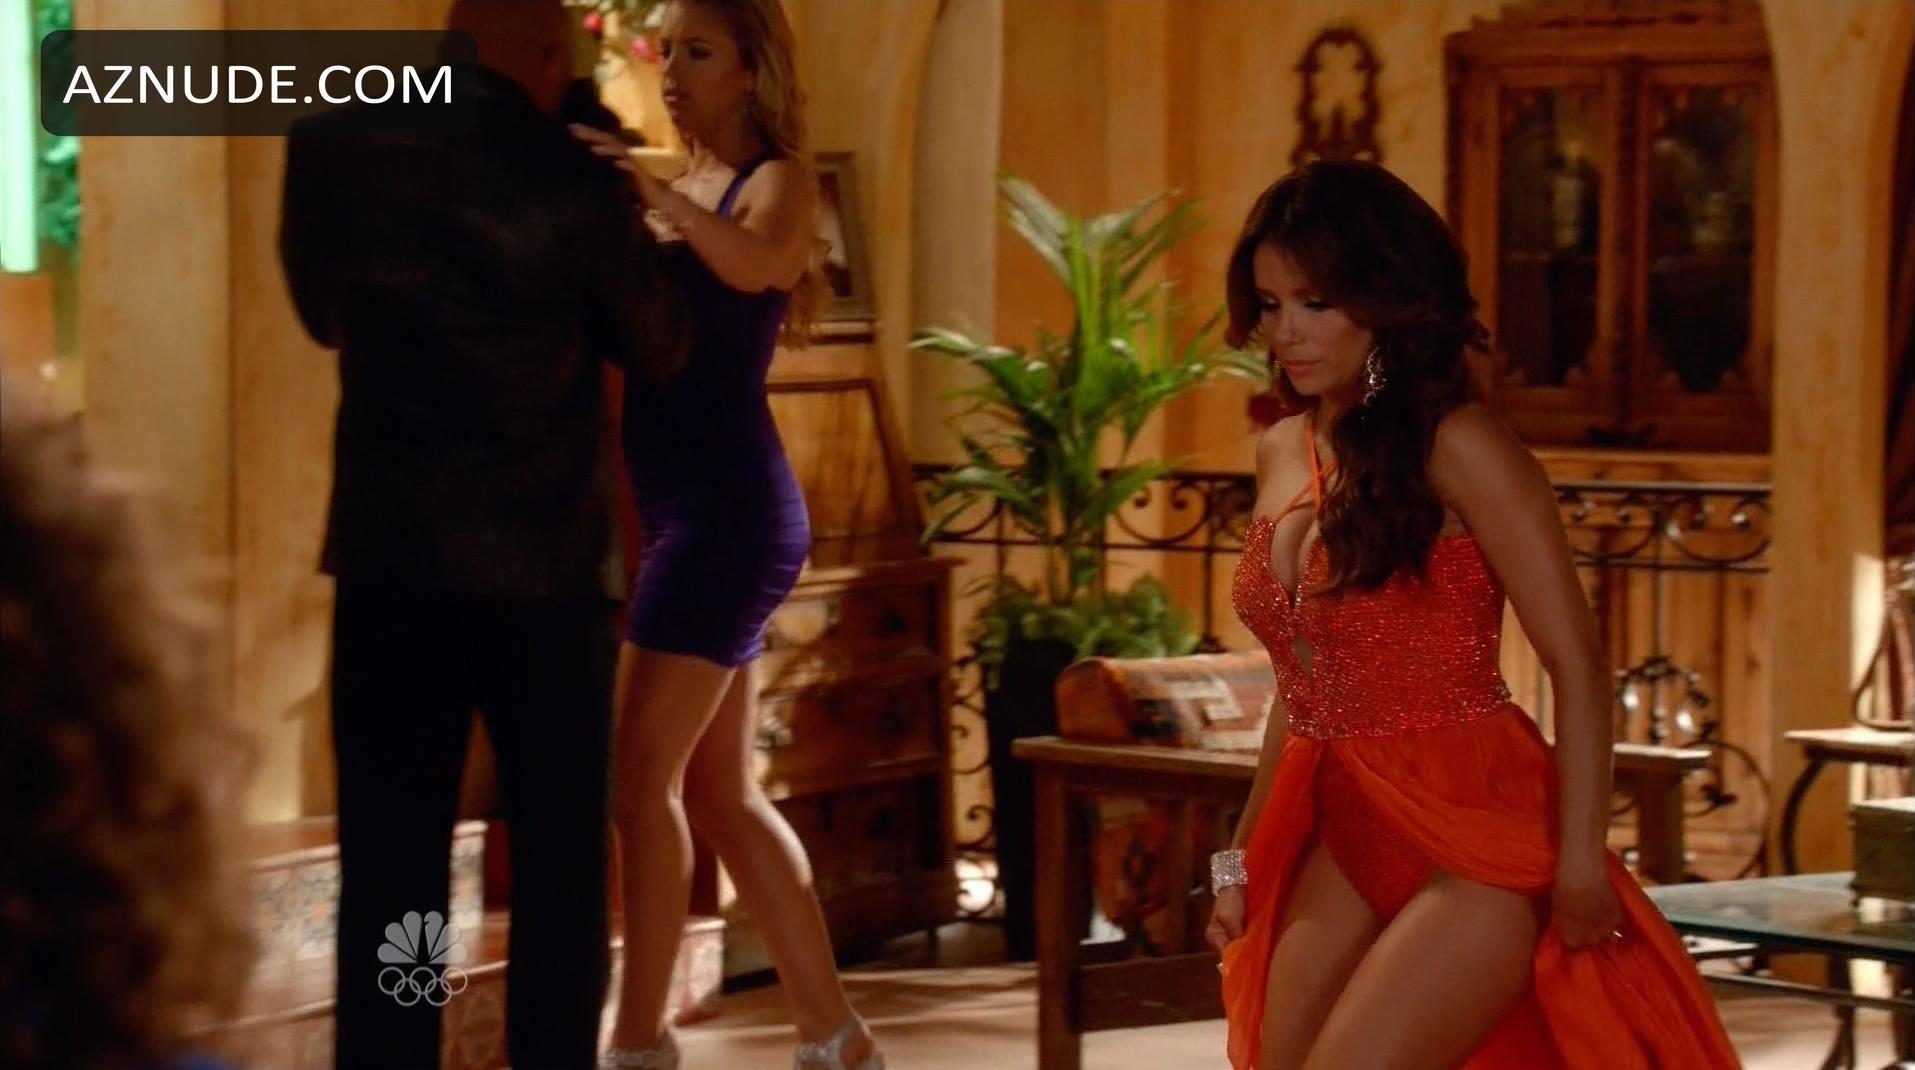 may-adult-telenovela-porn-chicks-riding-big